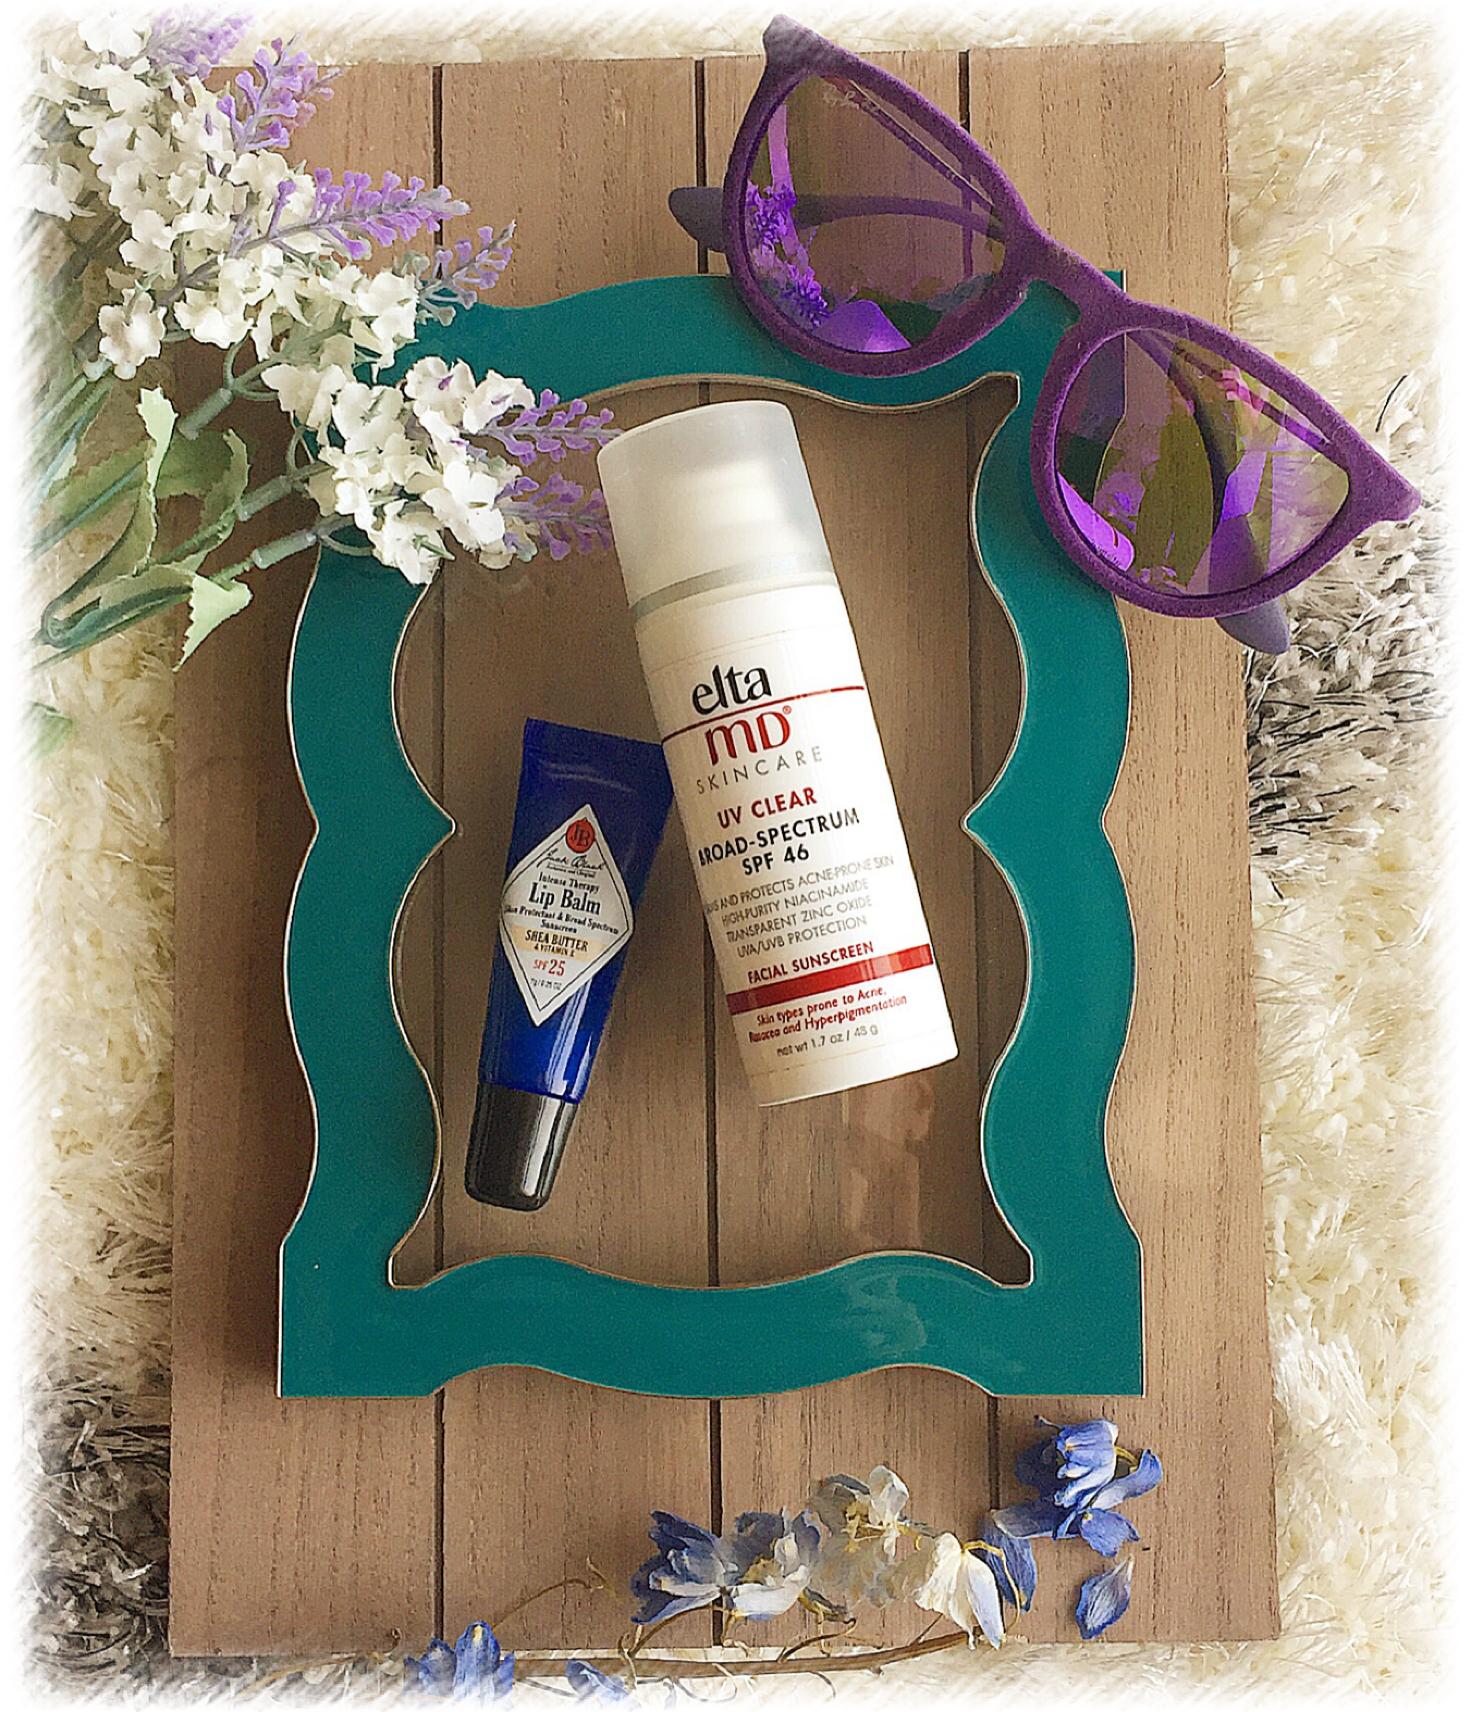 Rain or shine / daily sunscreen essentials